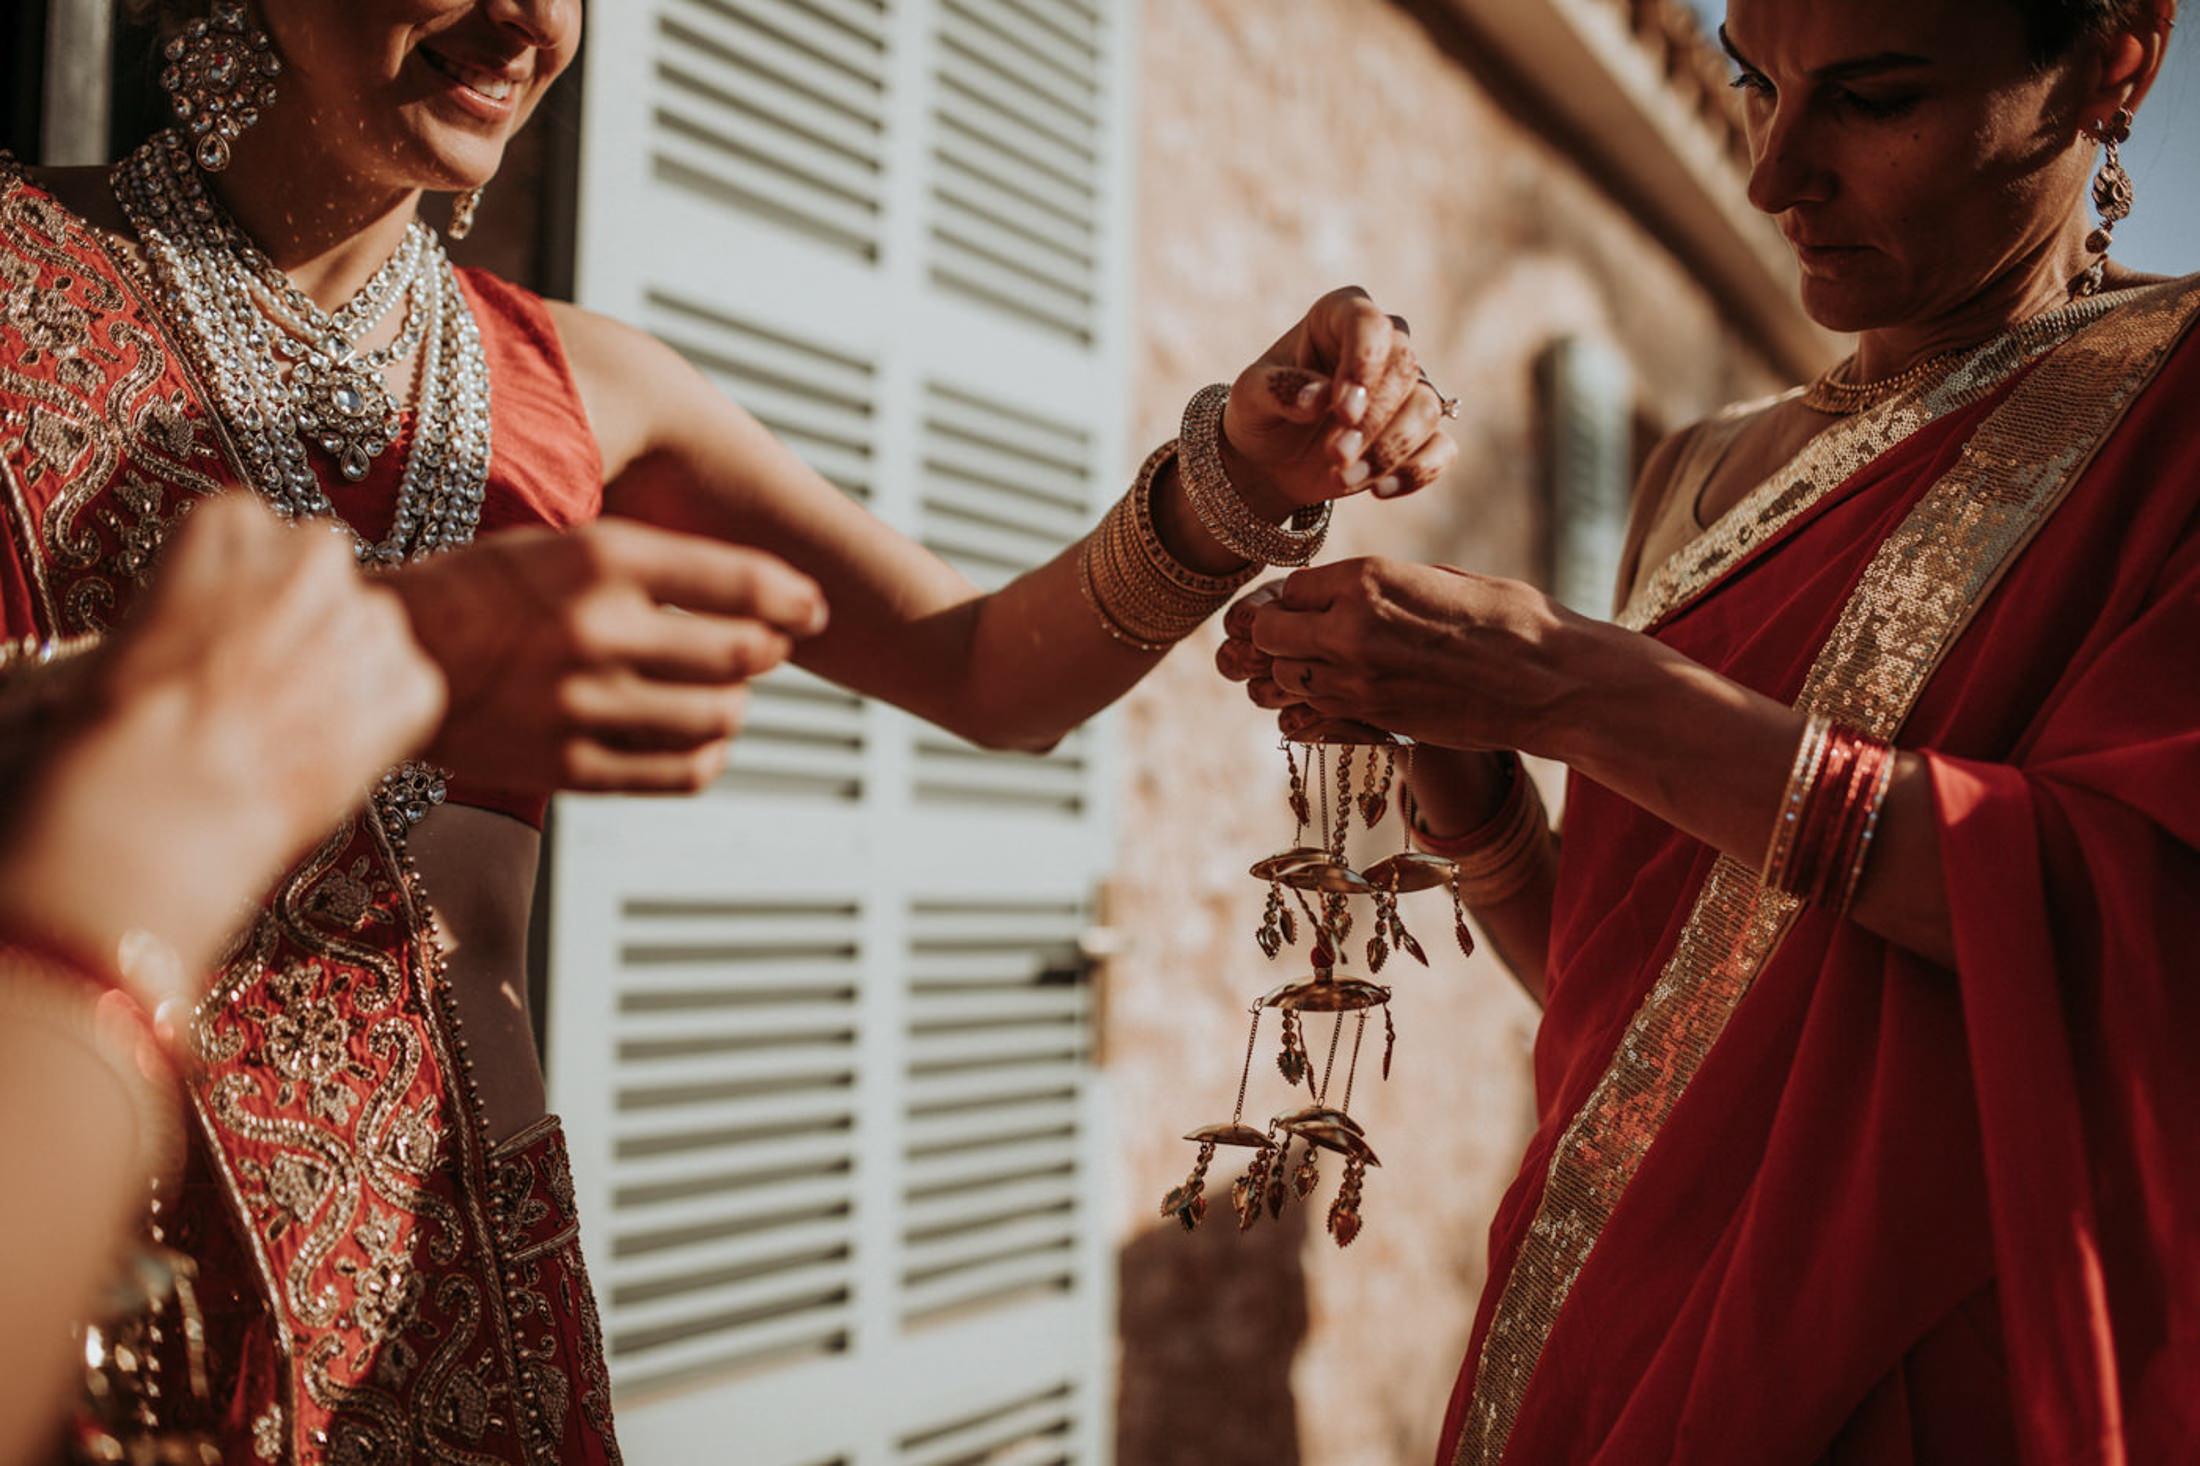 Wedding_Photographer_Mallorca_Daniela-Marquardt_Photography_New_York_Iceland_Tuscany_Santorini_Portugal_Austria_Bavaria_Elopement_Hochzeitsfotograf_AntjeRajat2_12